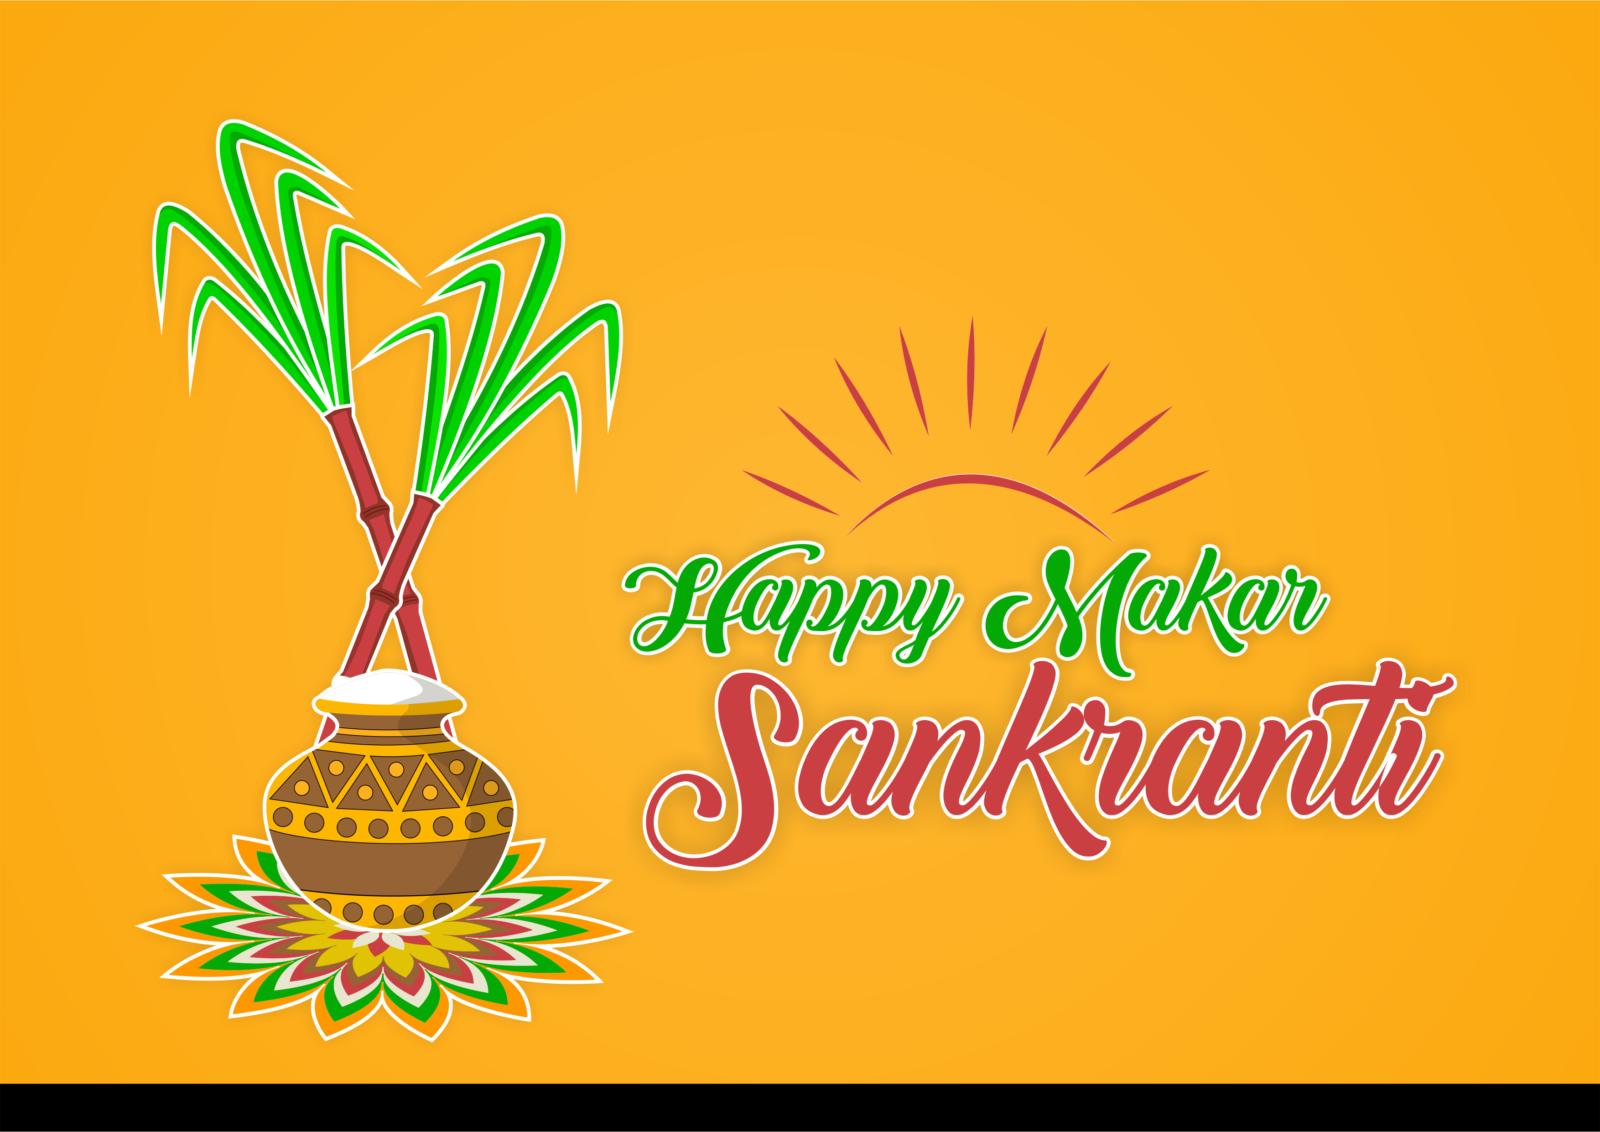 Sankranti images